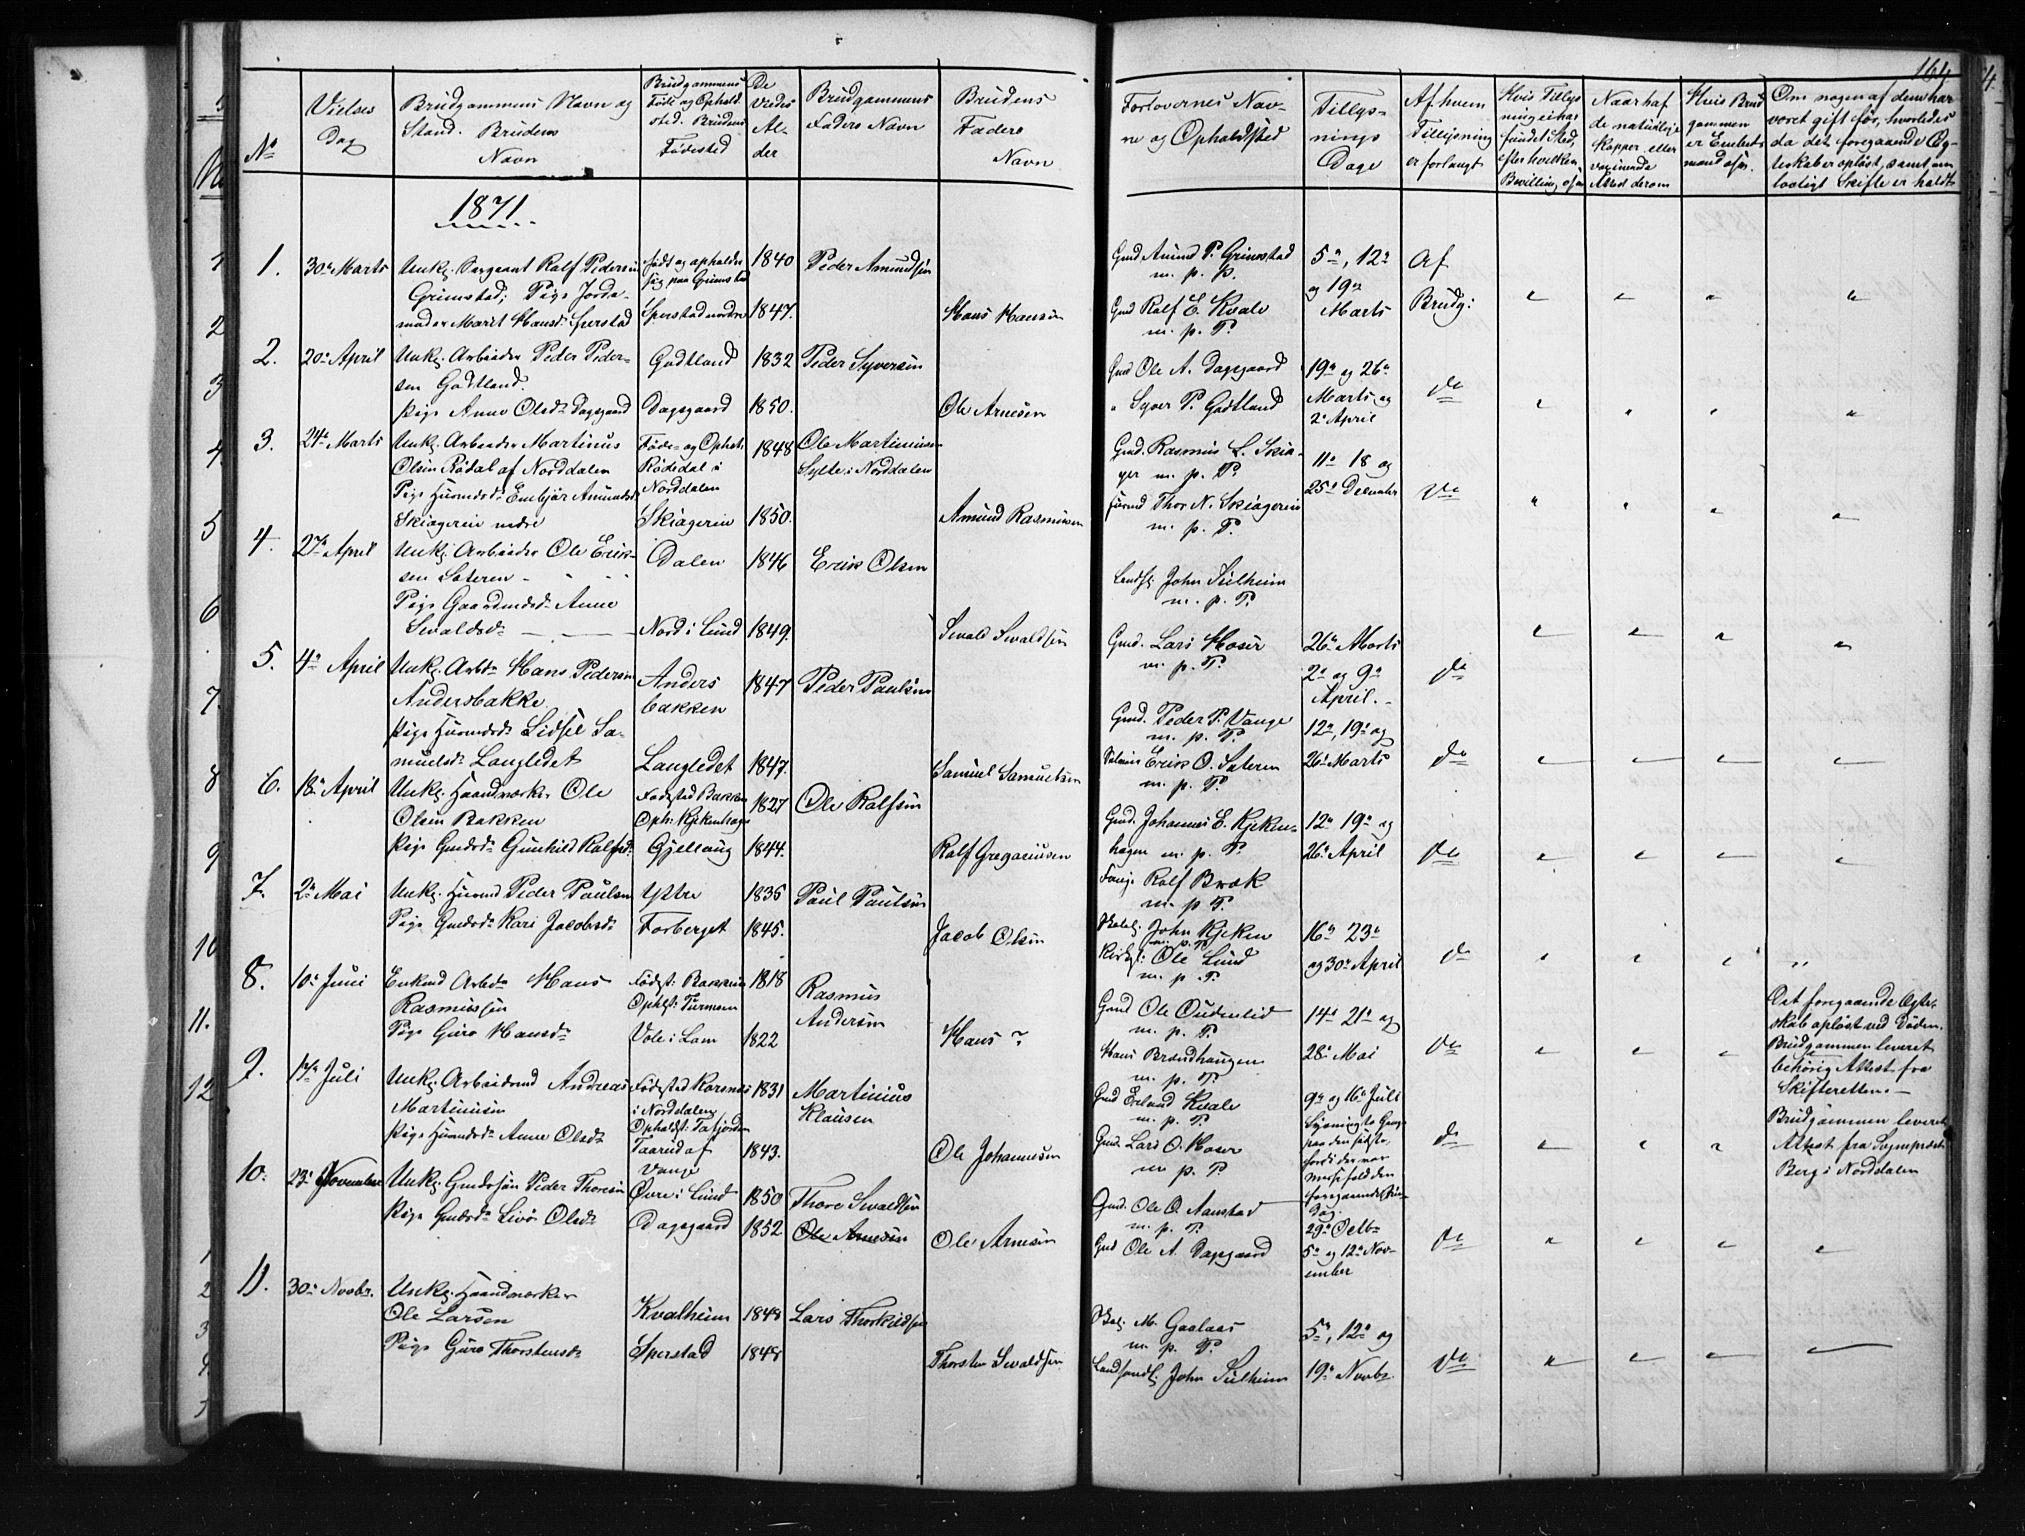 SAH, Skjåk prestekontor, Klokkerbok nr. 1, 1865-1893, s. 164